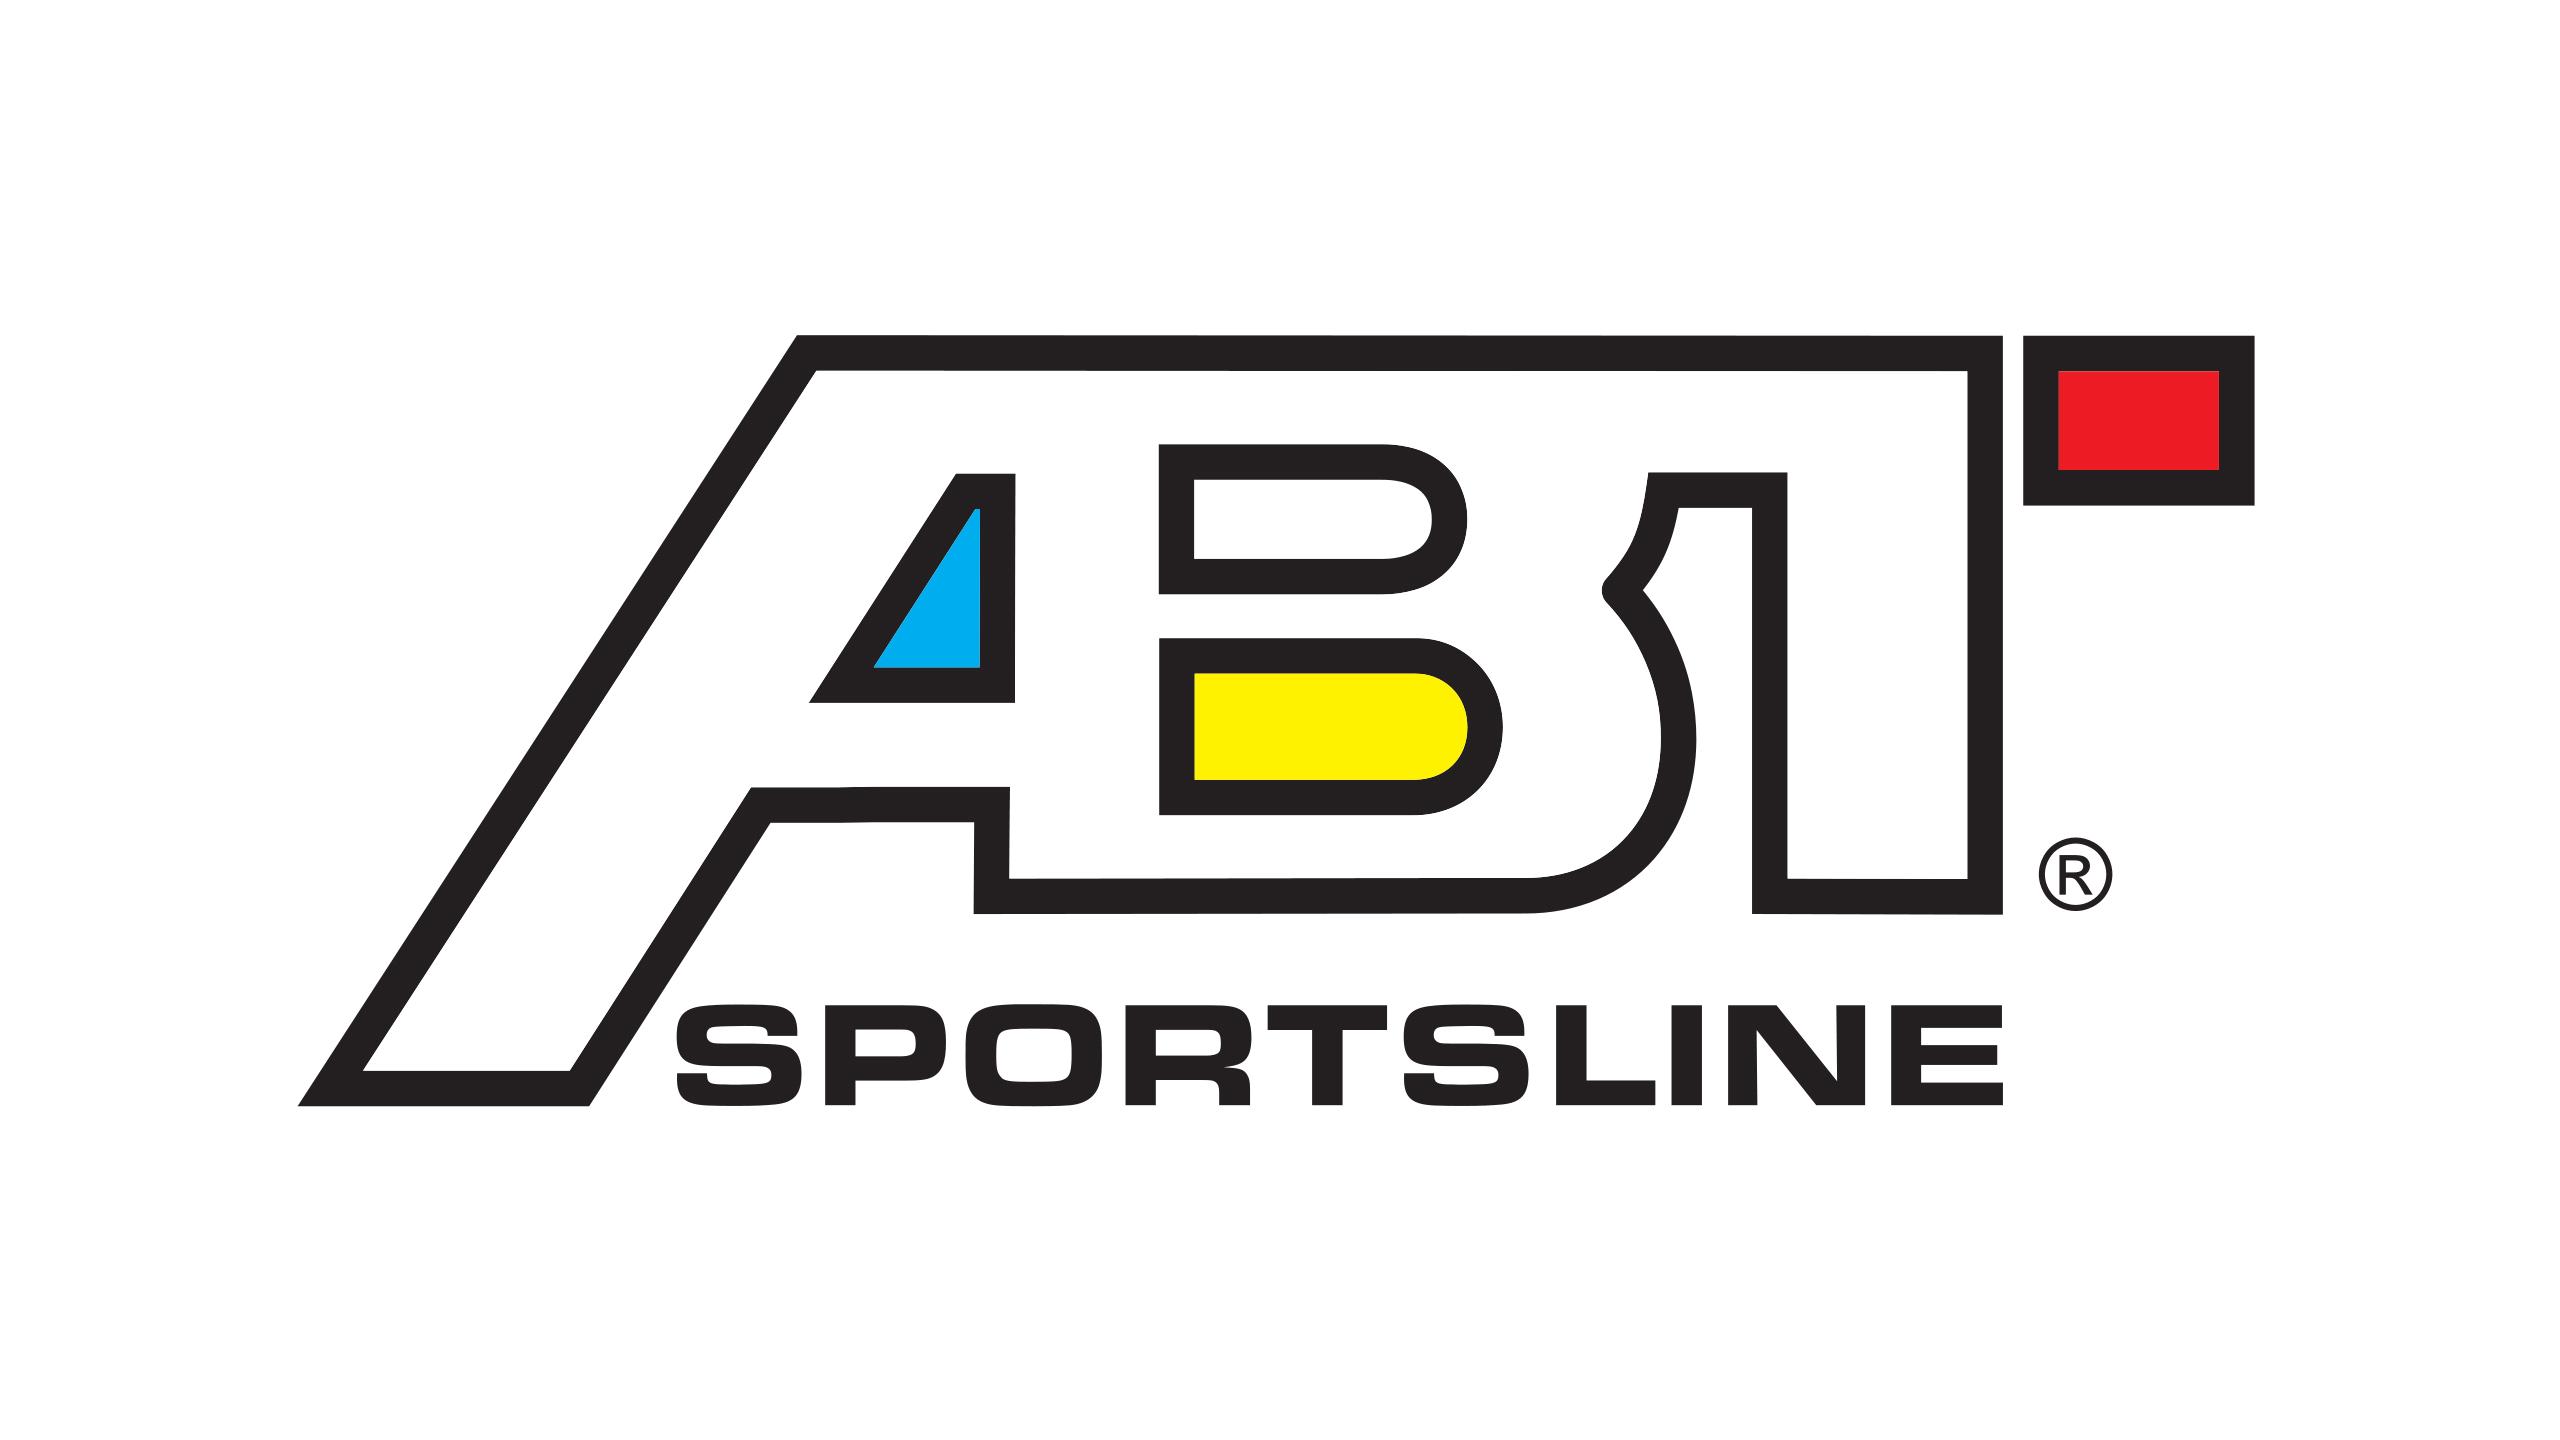 ABT Sportsline Logo 2560x1440 HD Png - Abt Sportsline PNG